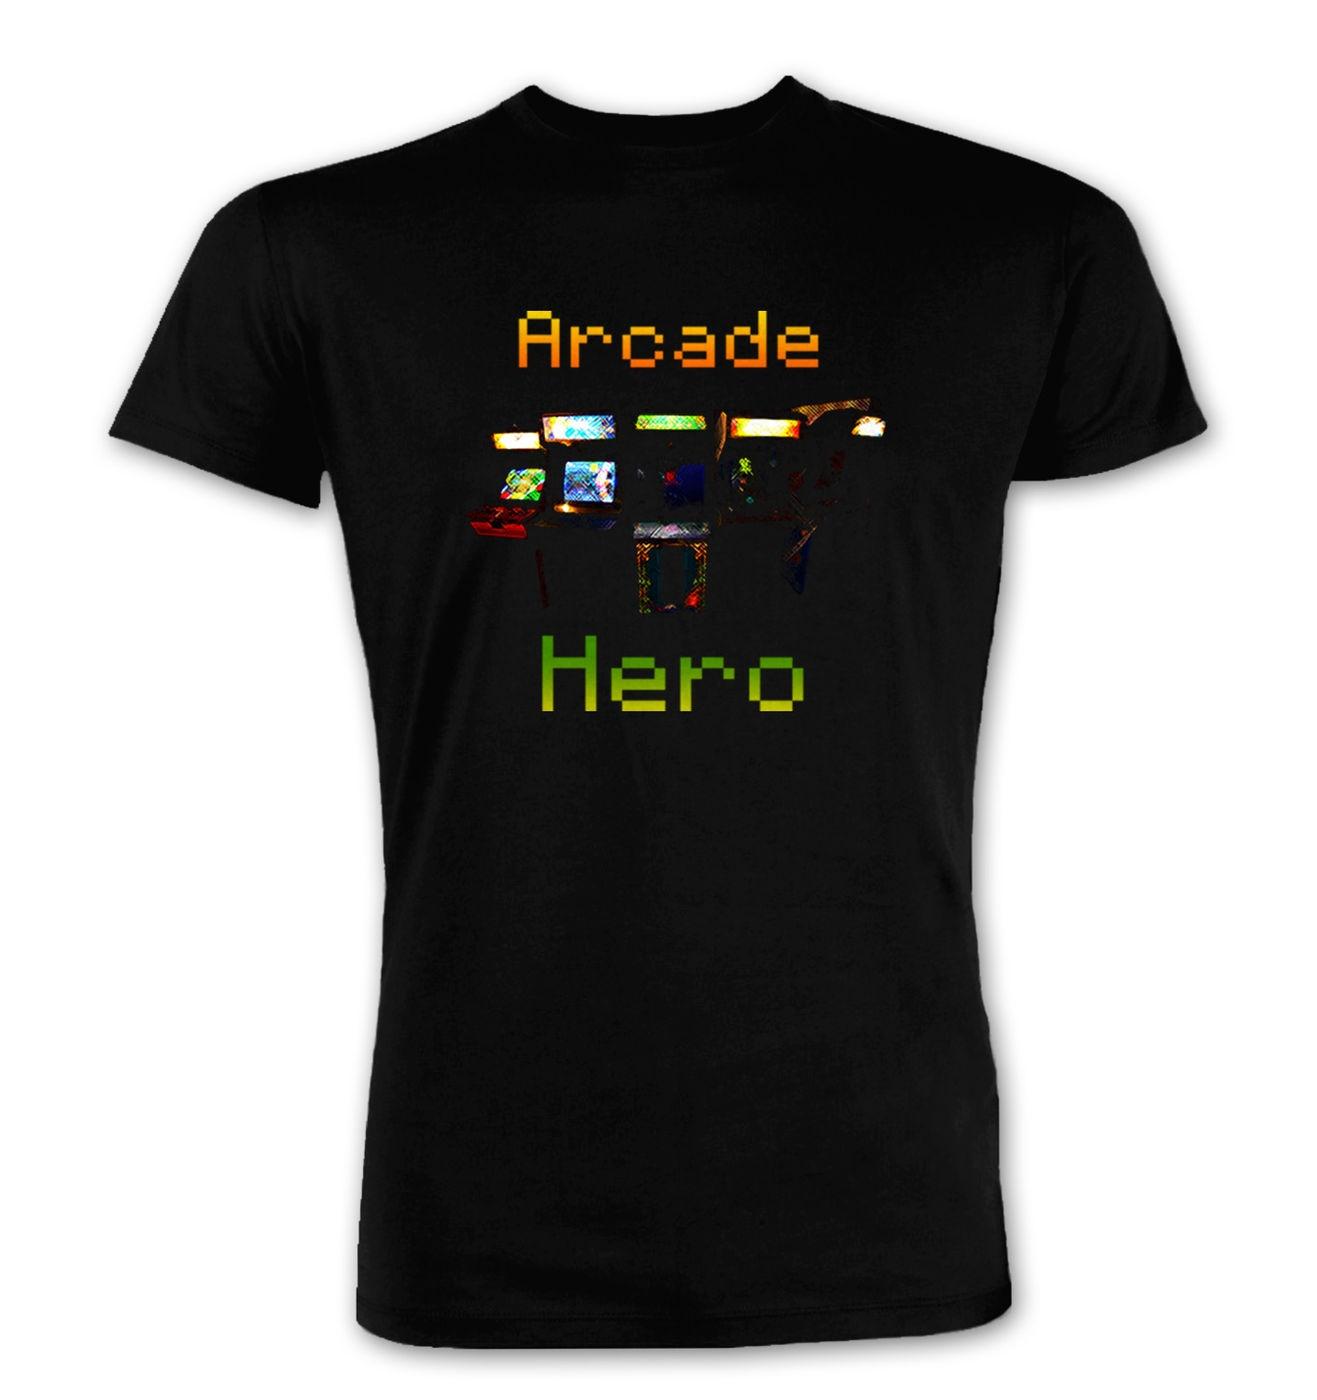 Arcade Hero premium t-shirt by Something Geeky